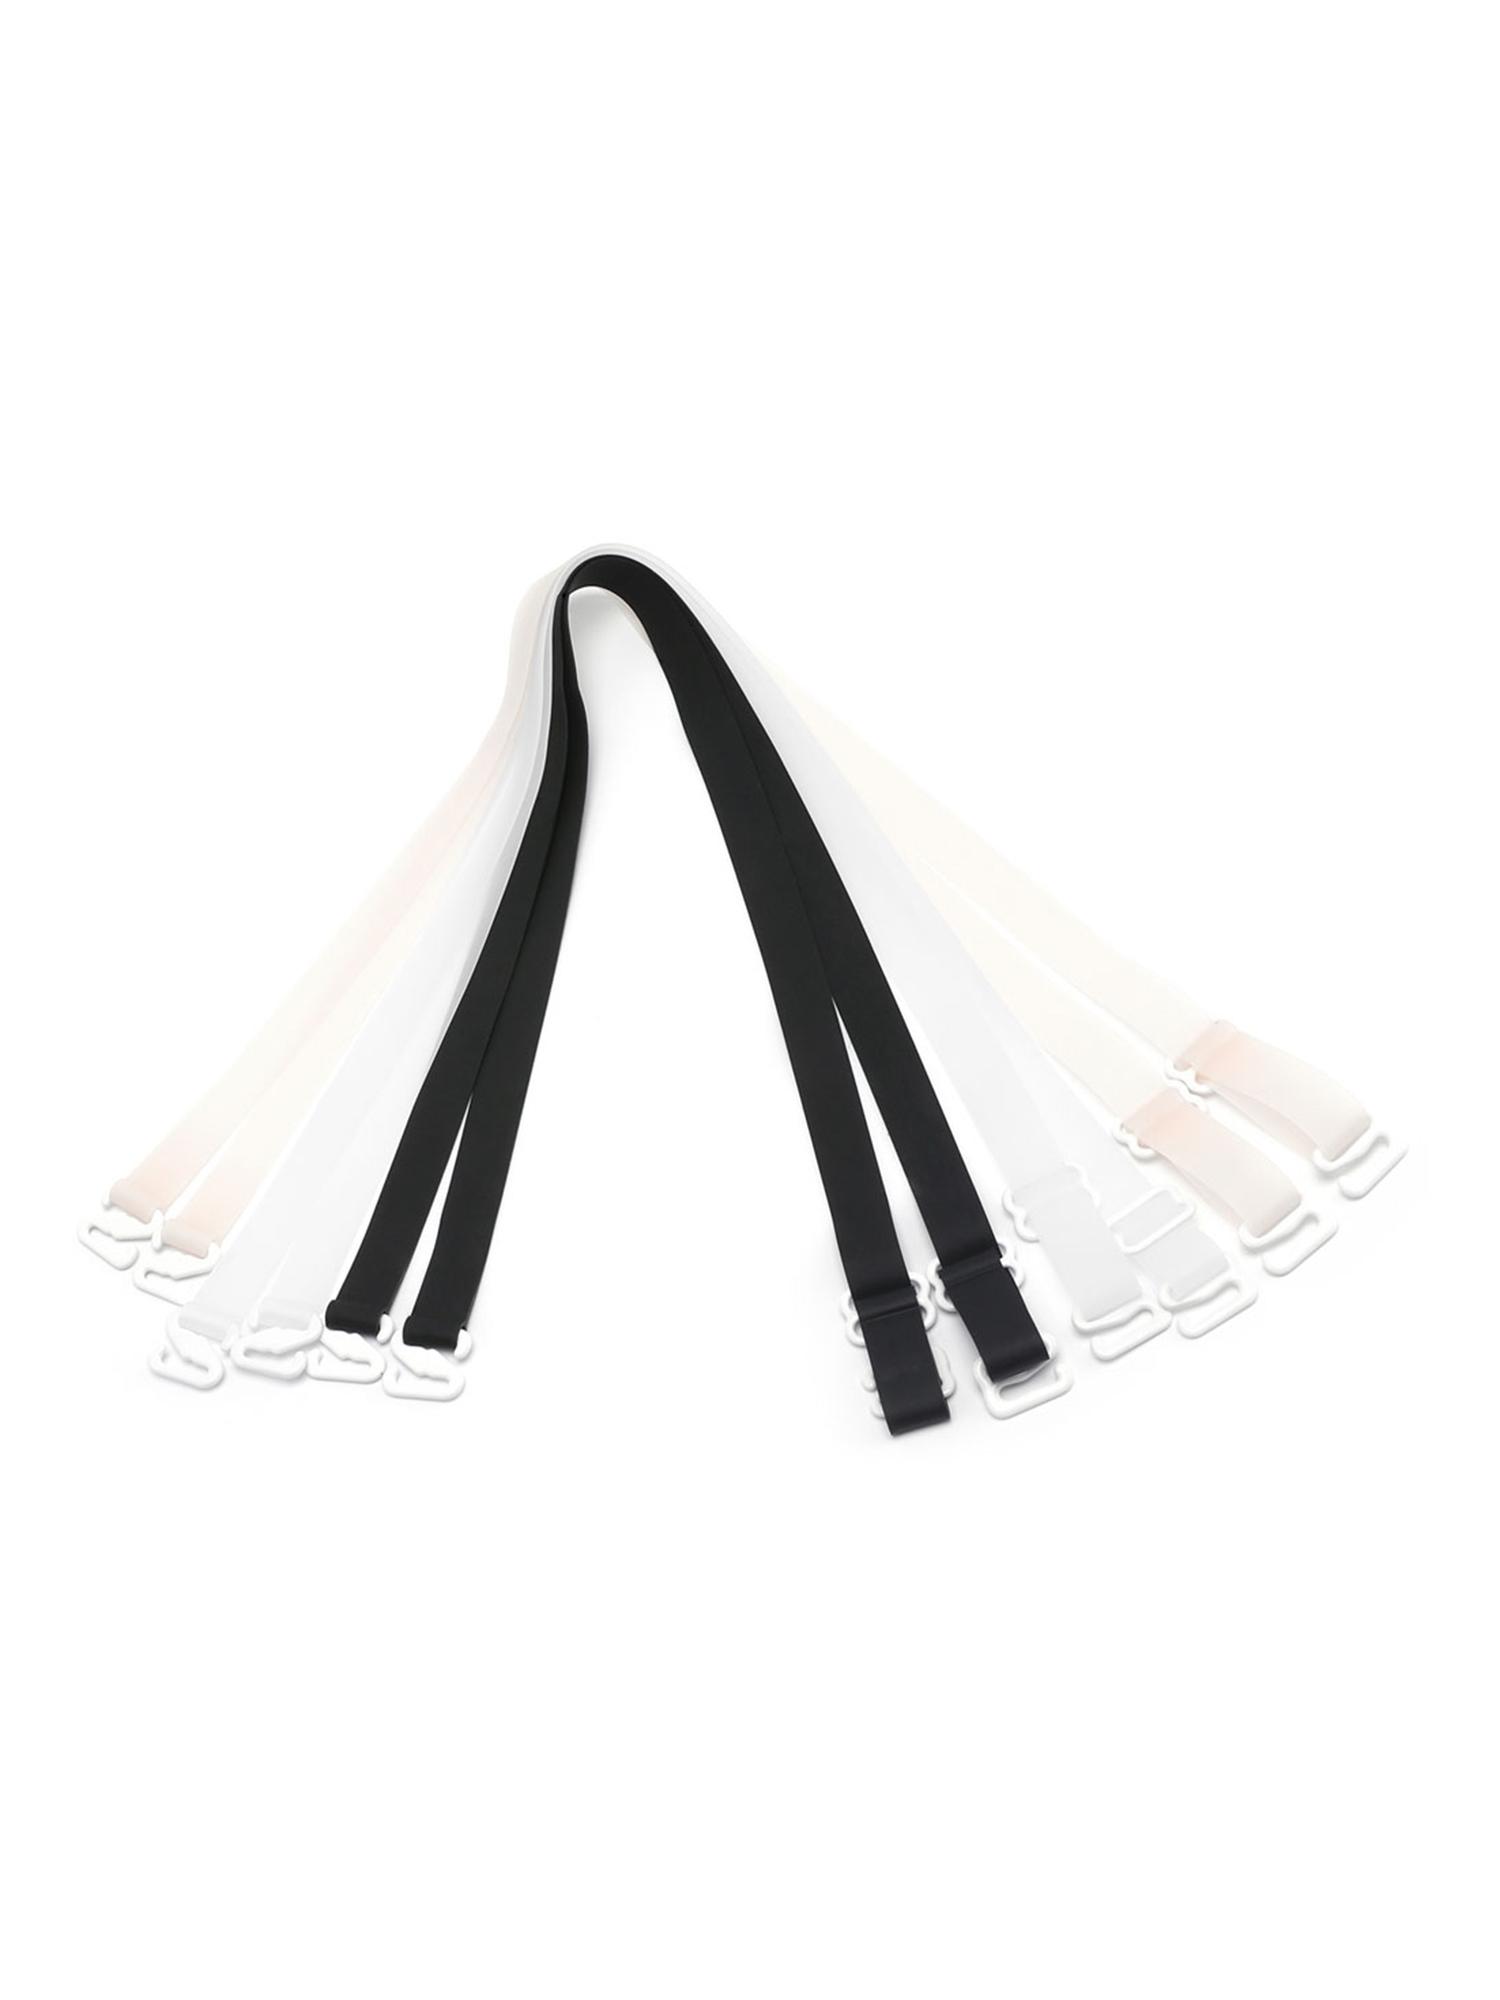 2x Adjutable Clear Soft Plastic Invisible Bra Shoulder Straps